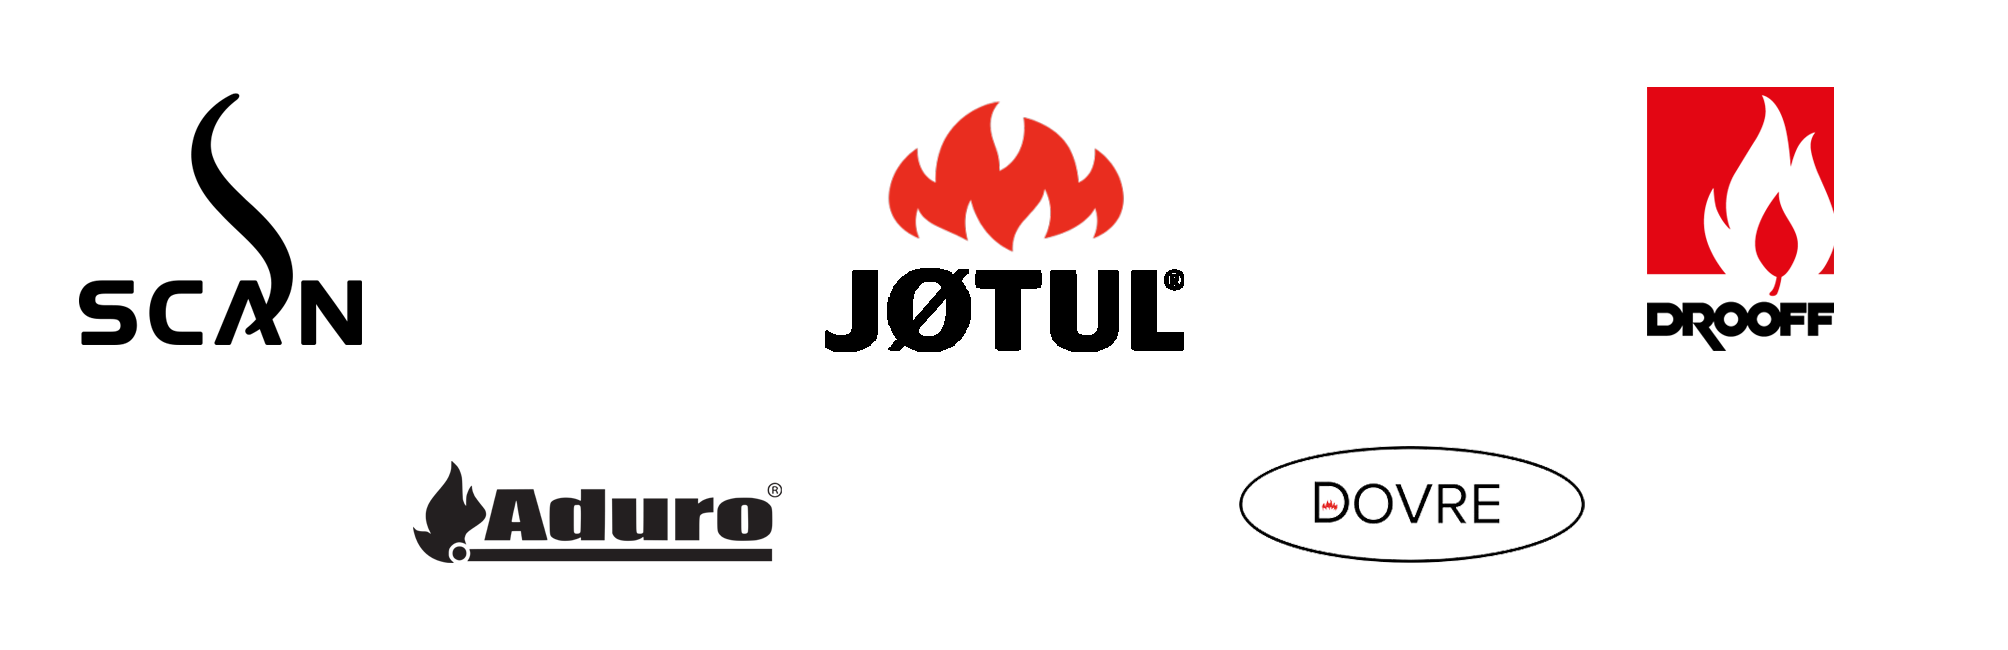 hersteller-logo-zubehoer